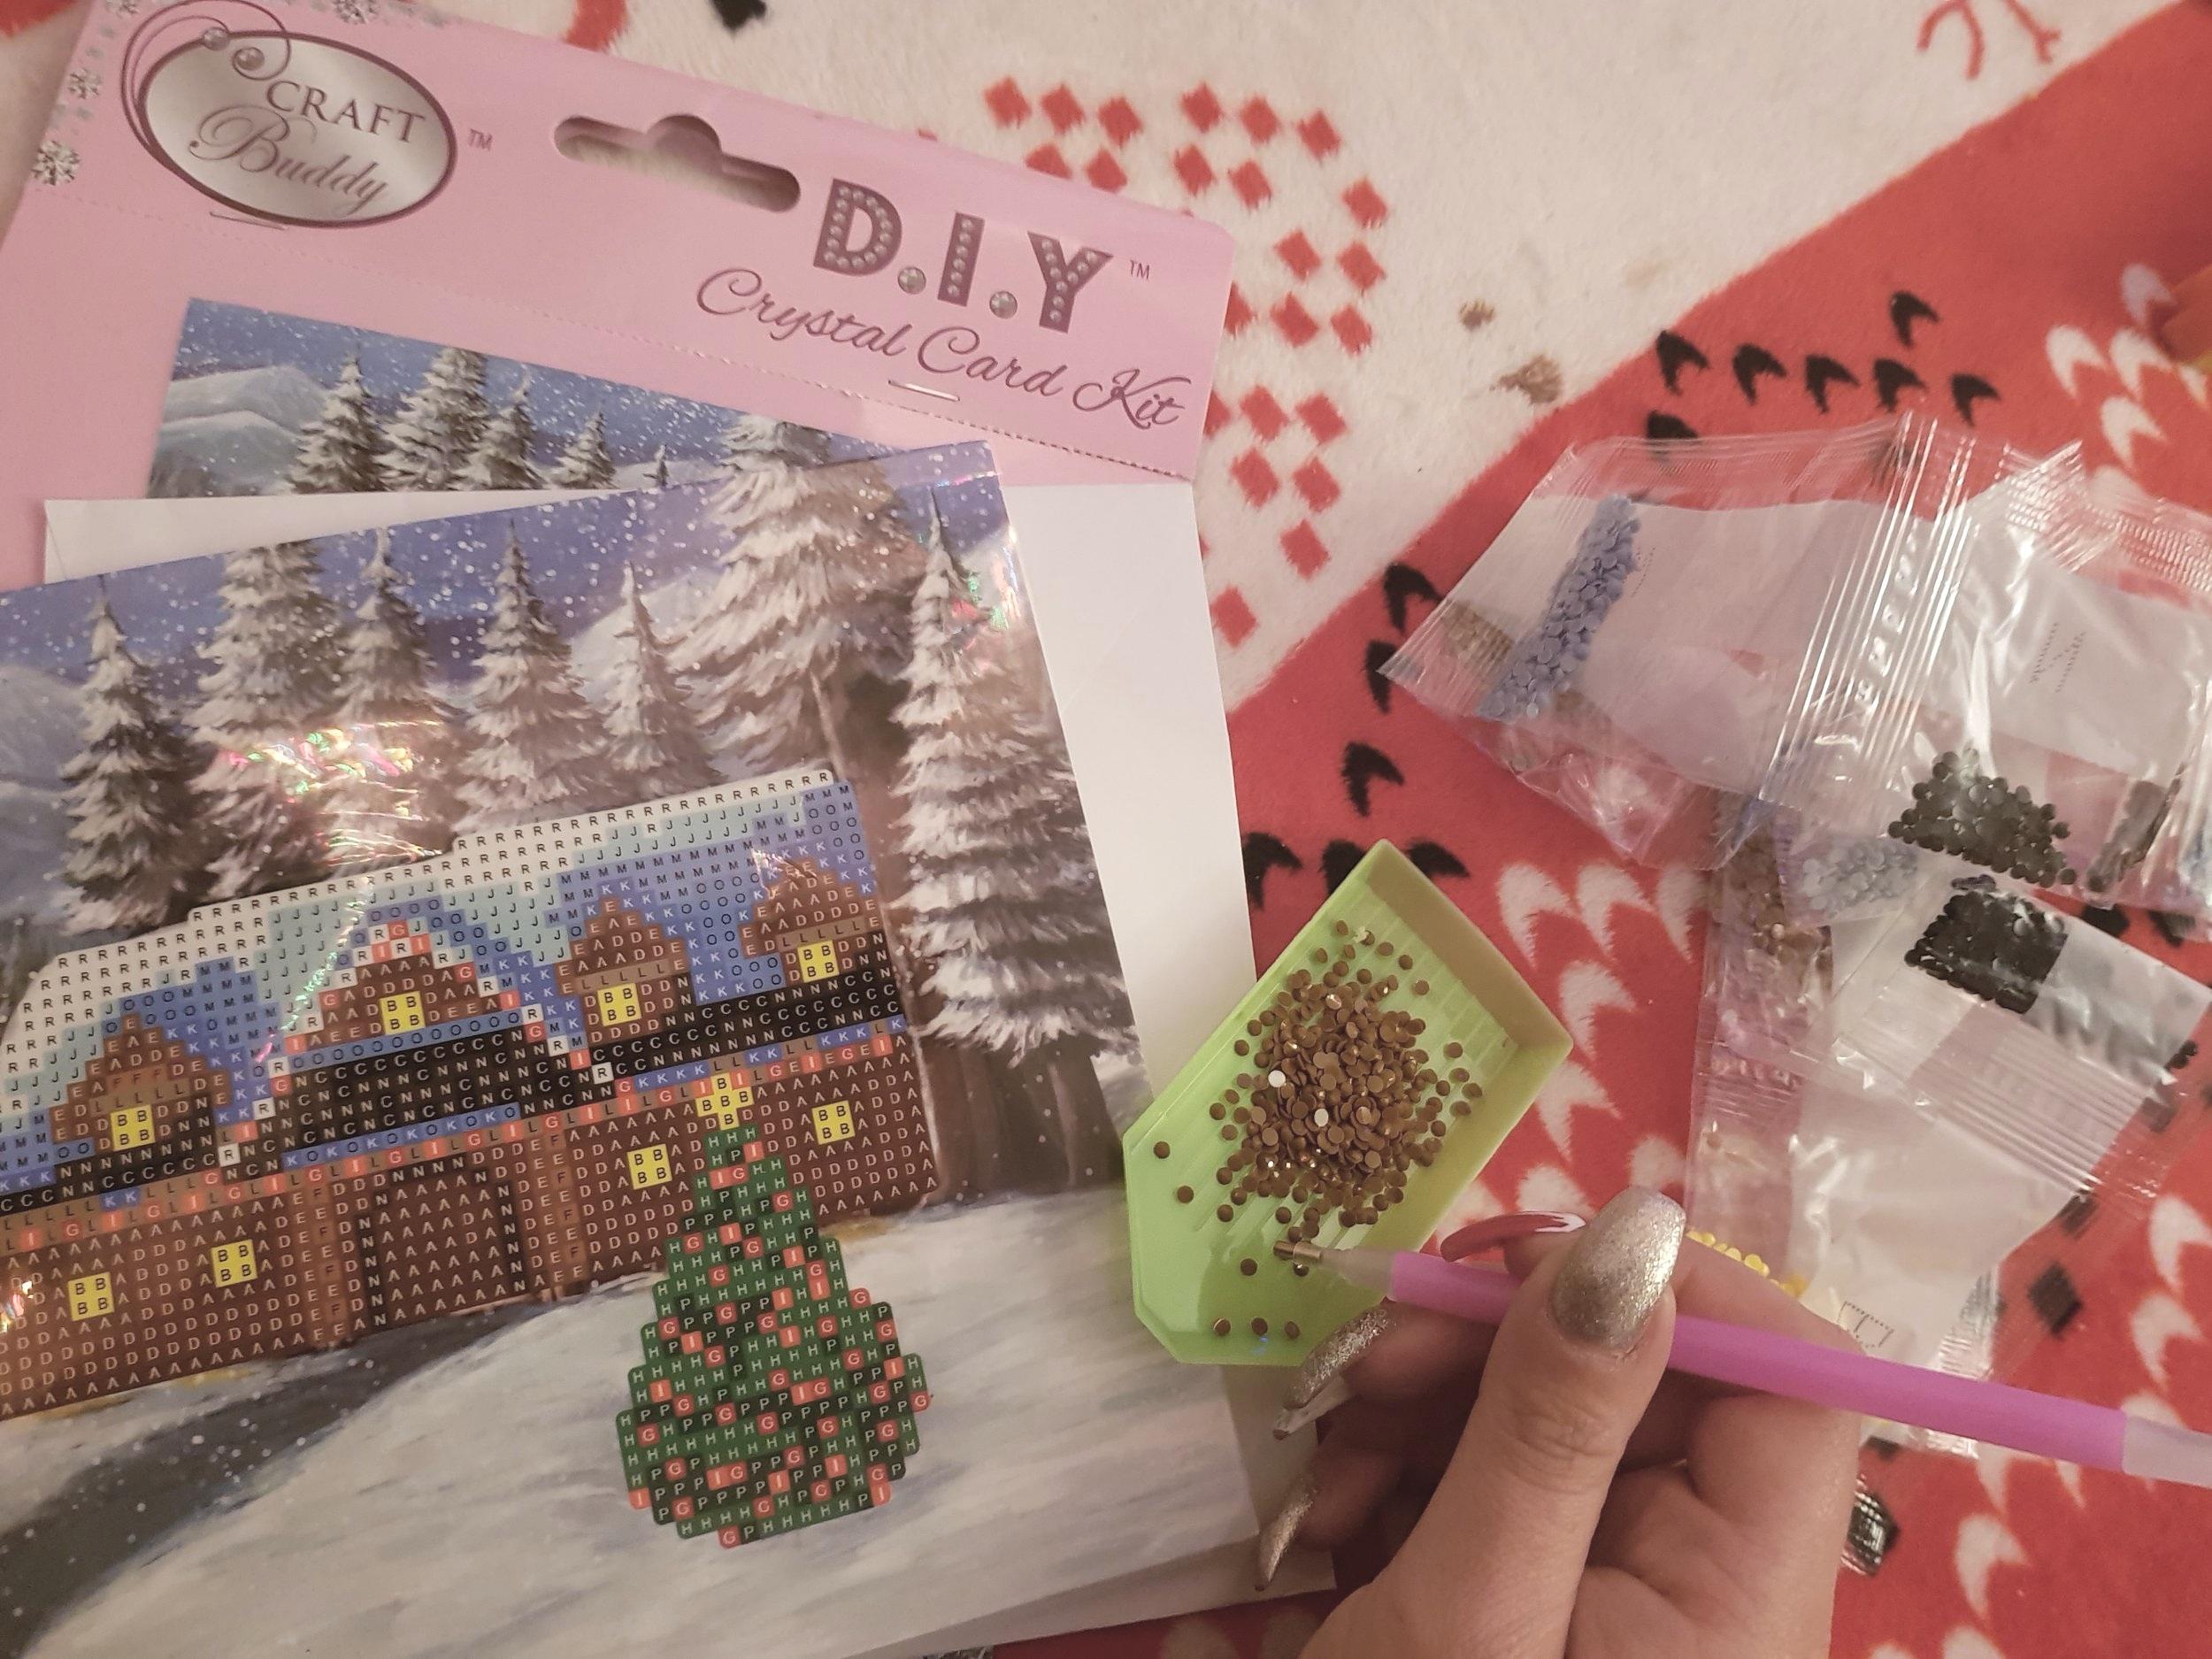 Craft Buddy DIY Crystal Card Kit